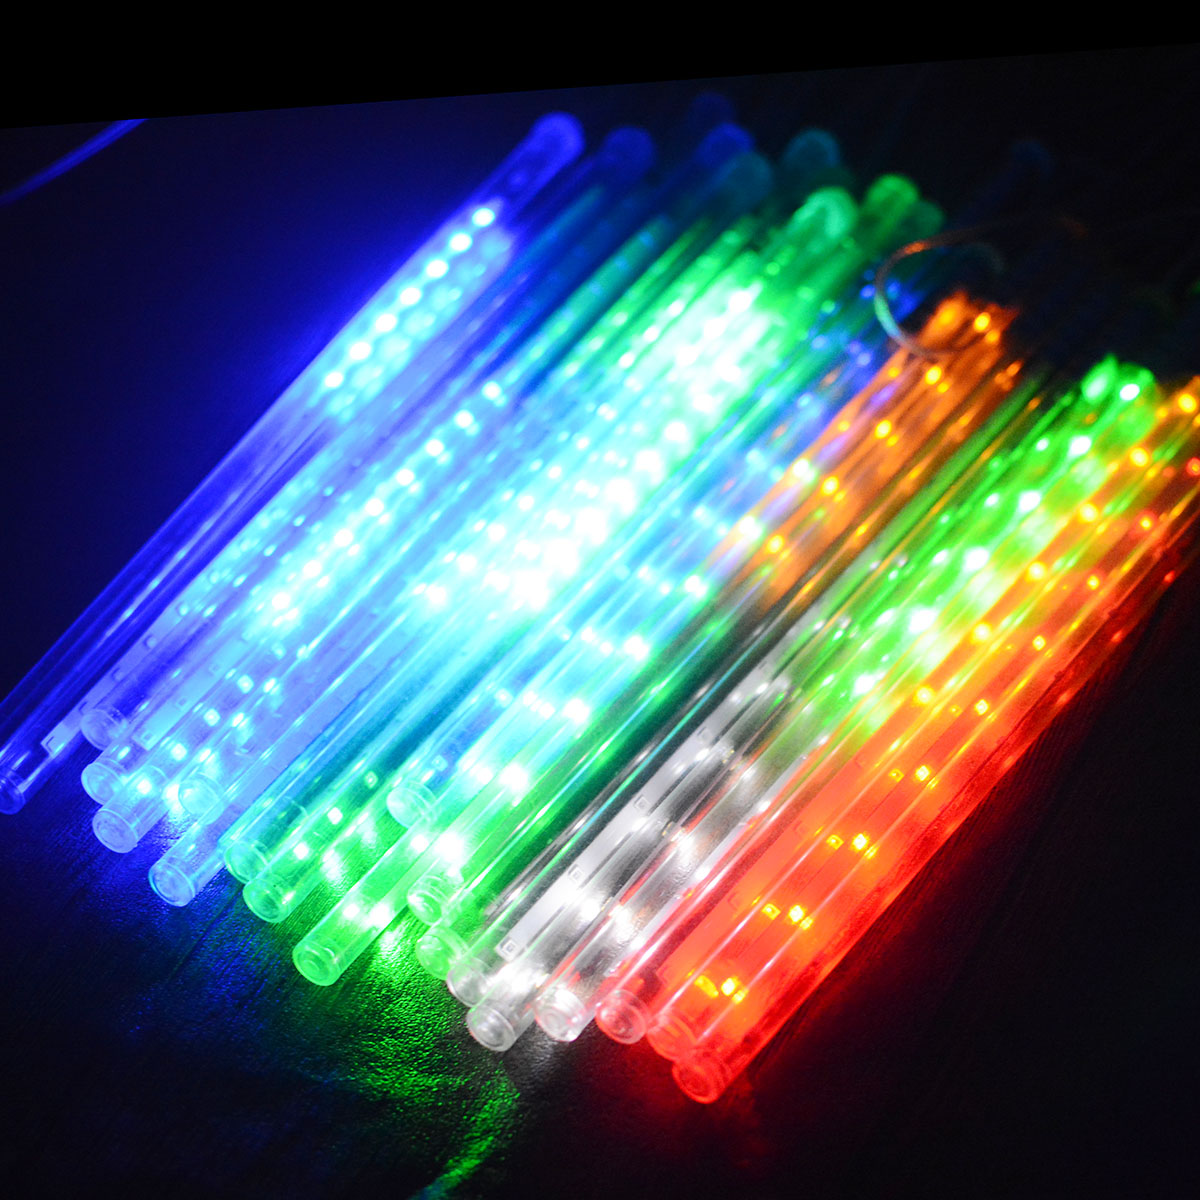 10Tubes LED 30cm Meteor Shower Solar Power Lamp Falling Rain Fairy String Lights Ultra Bright Drop Festival Decoration Light